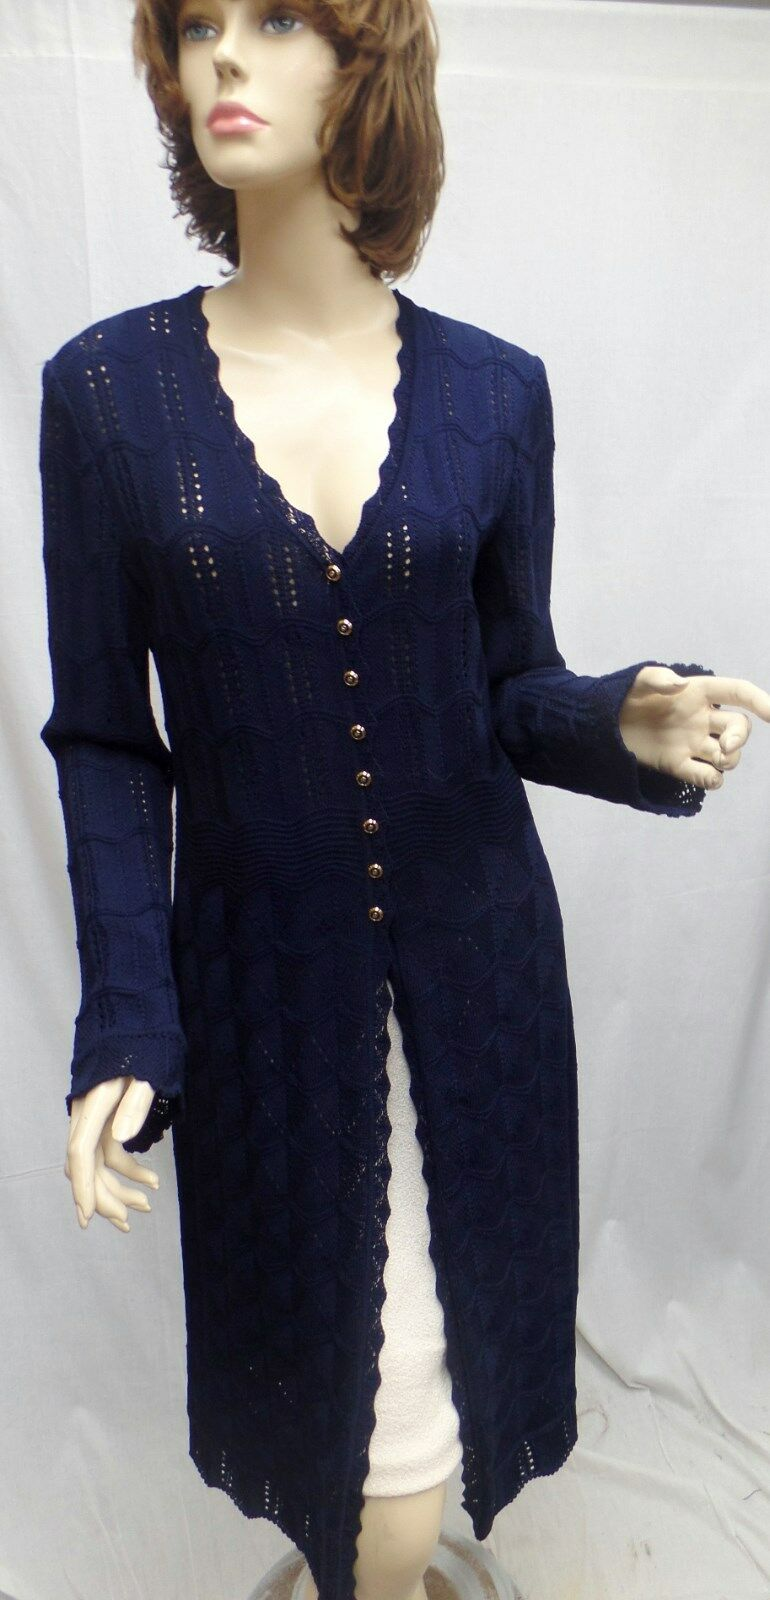 St John Knit COLLECTION NWT Navy Santana Knit COAT DRESS SZ 8